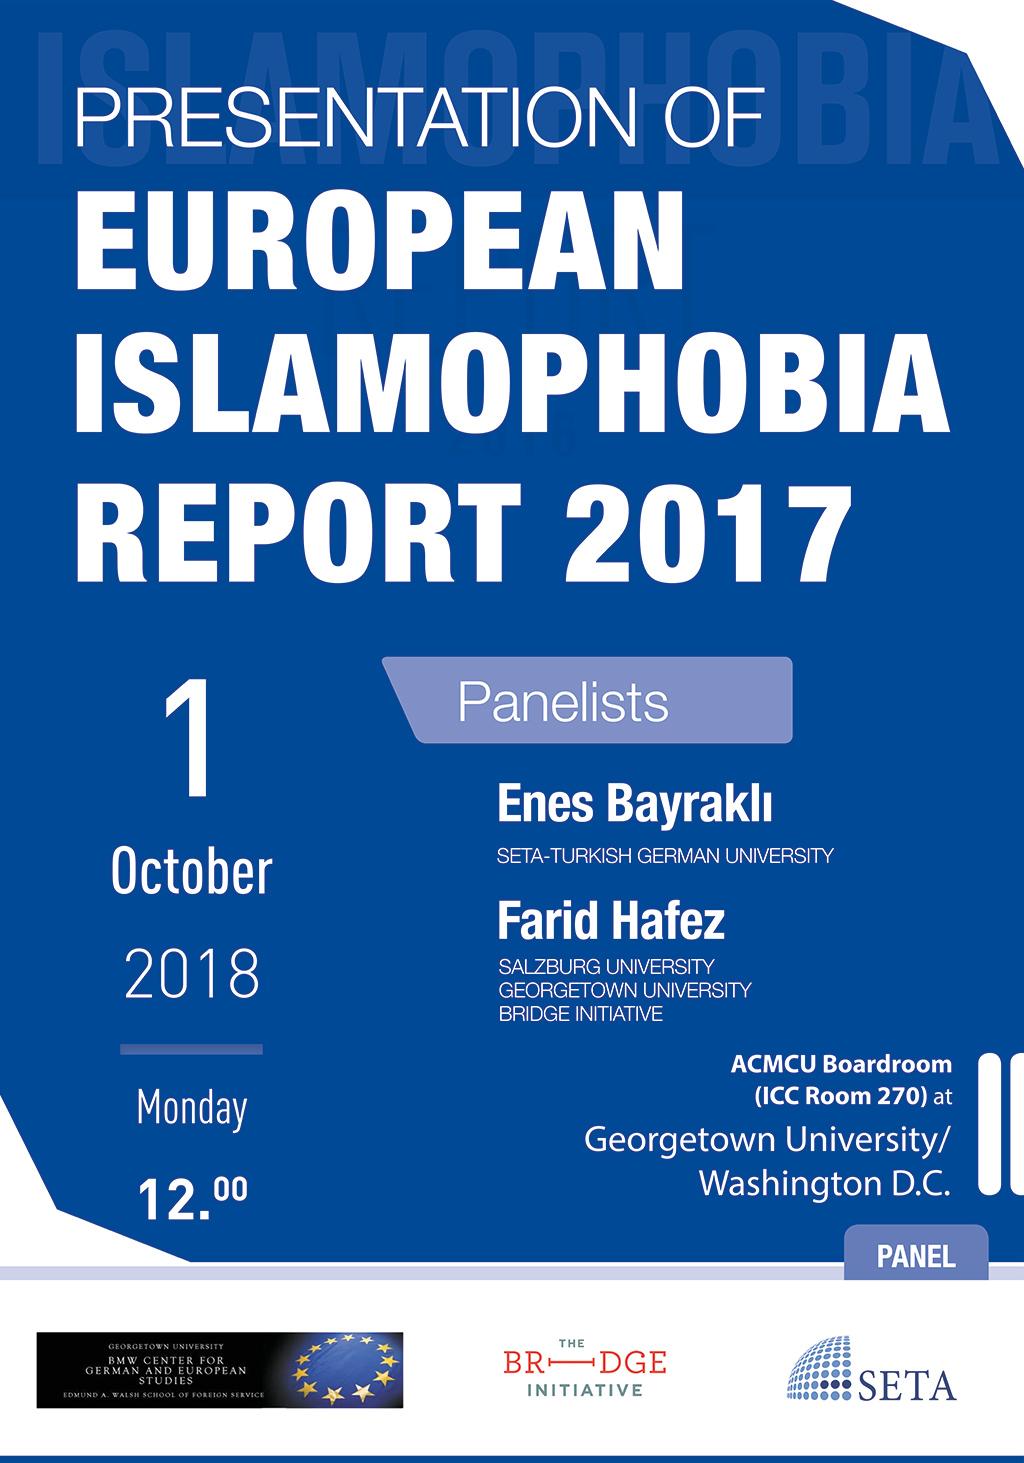 Presentation of European Islamophobia Report 2017 | Georgetown